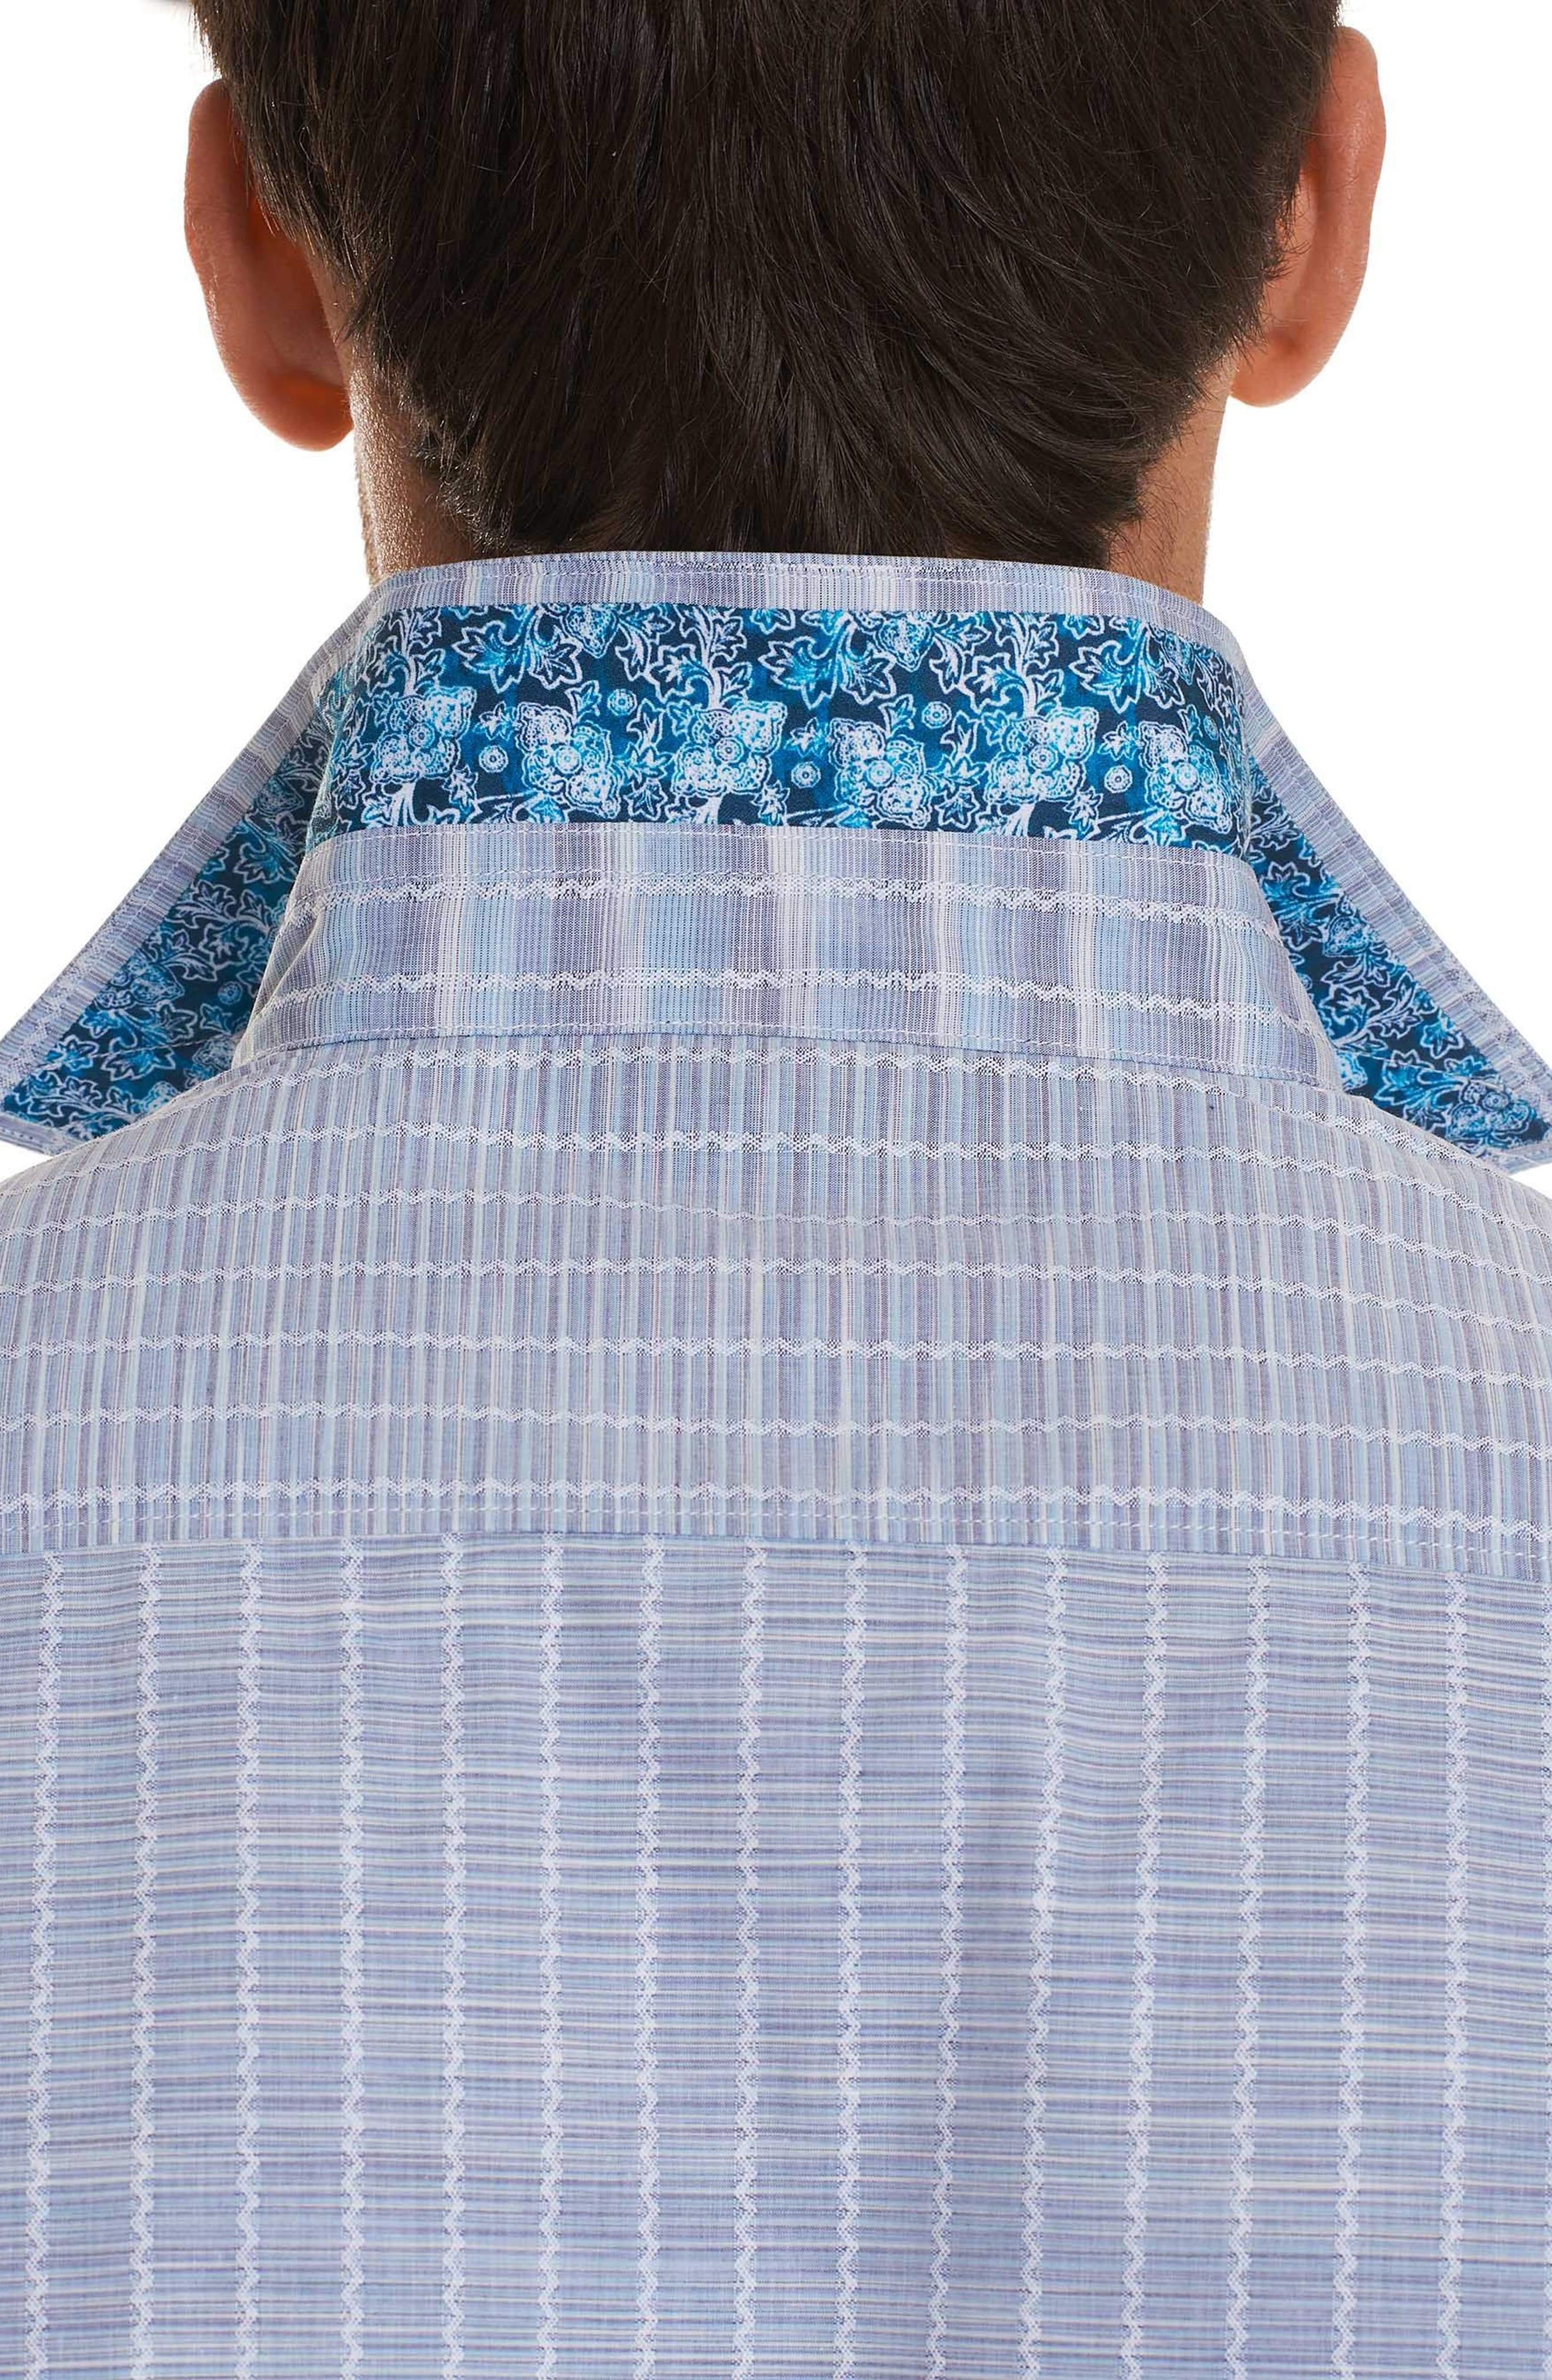 Cano Classic Fit Sport Shirt,                             Alternate thumbnail 5, color,                             Blue